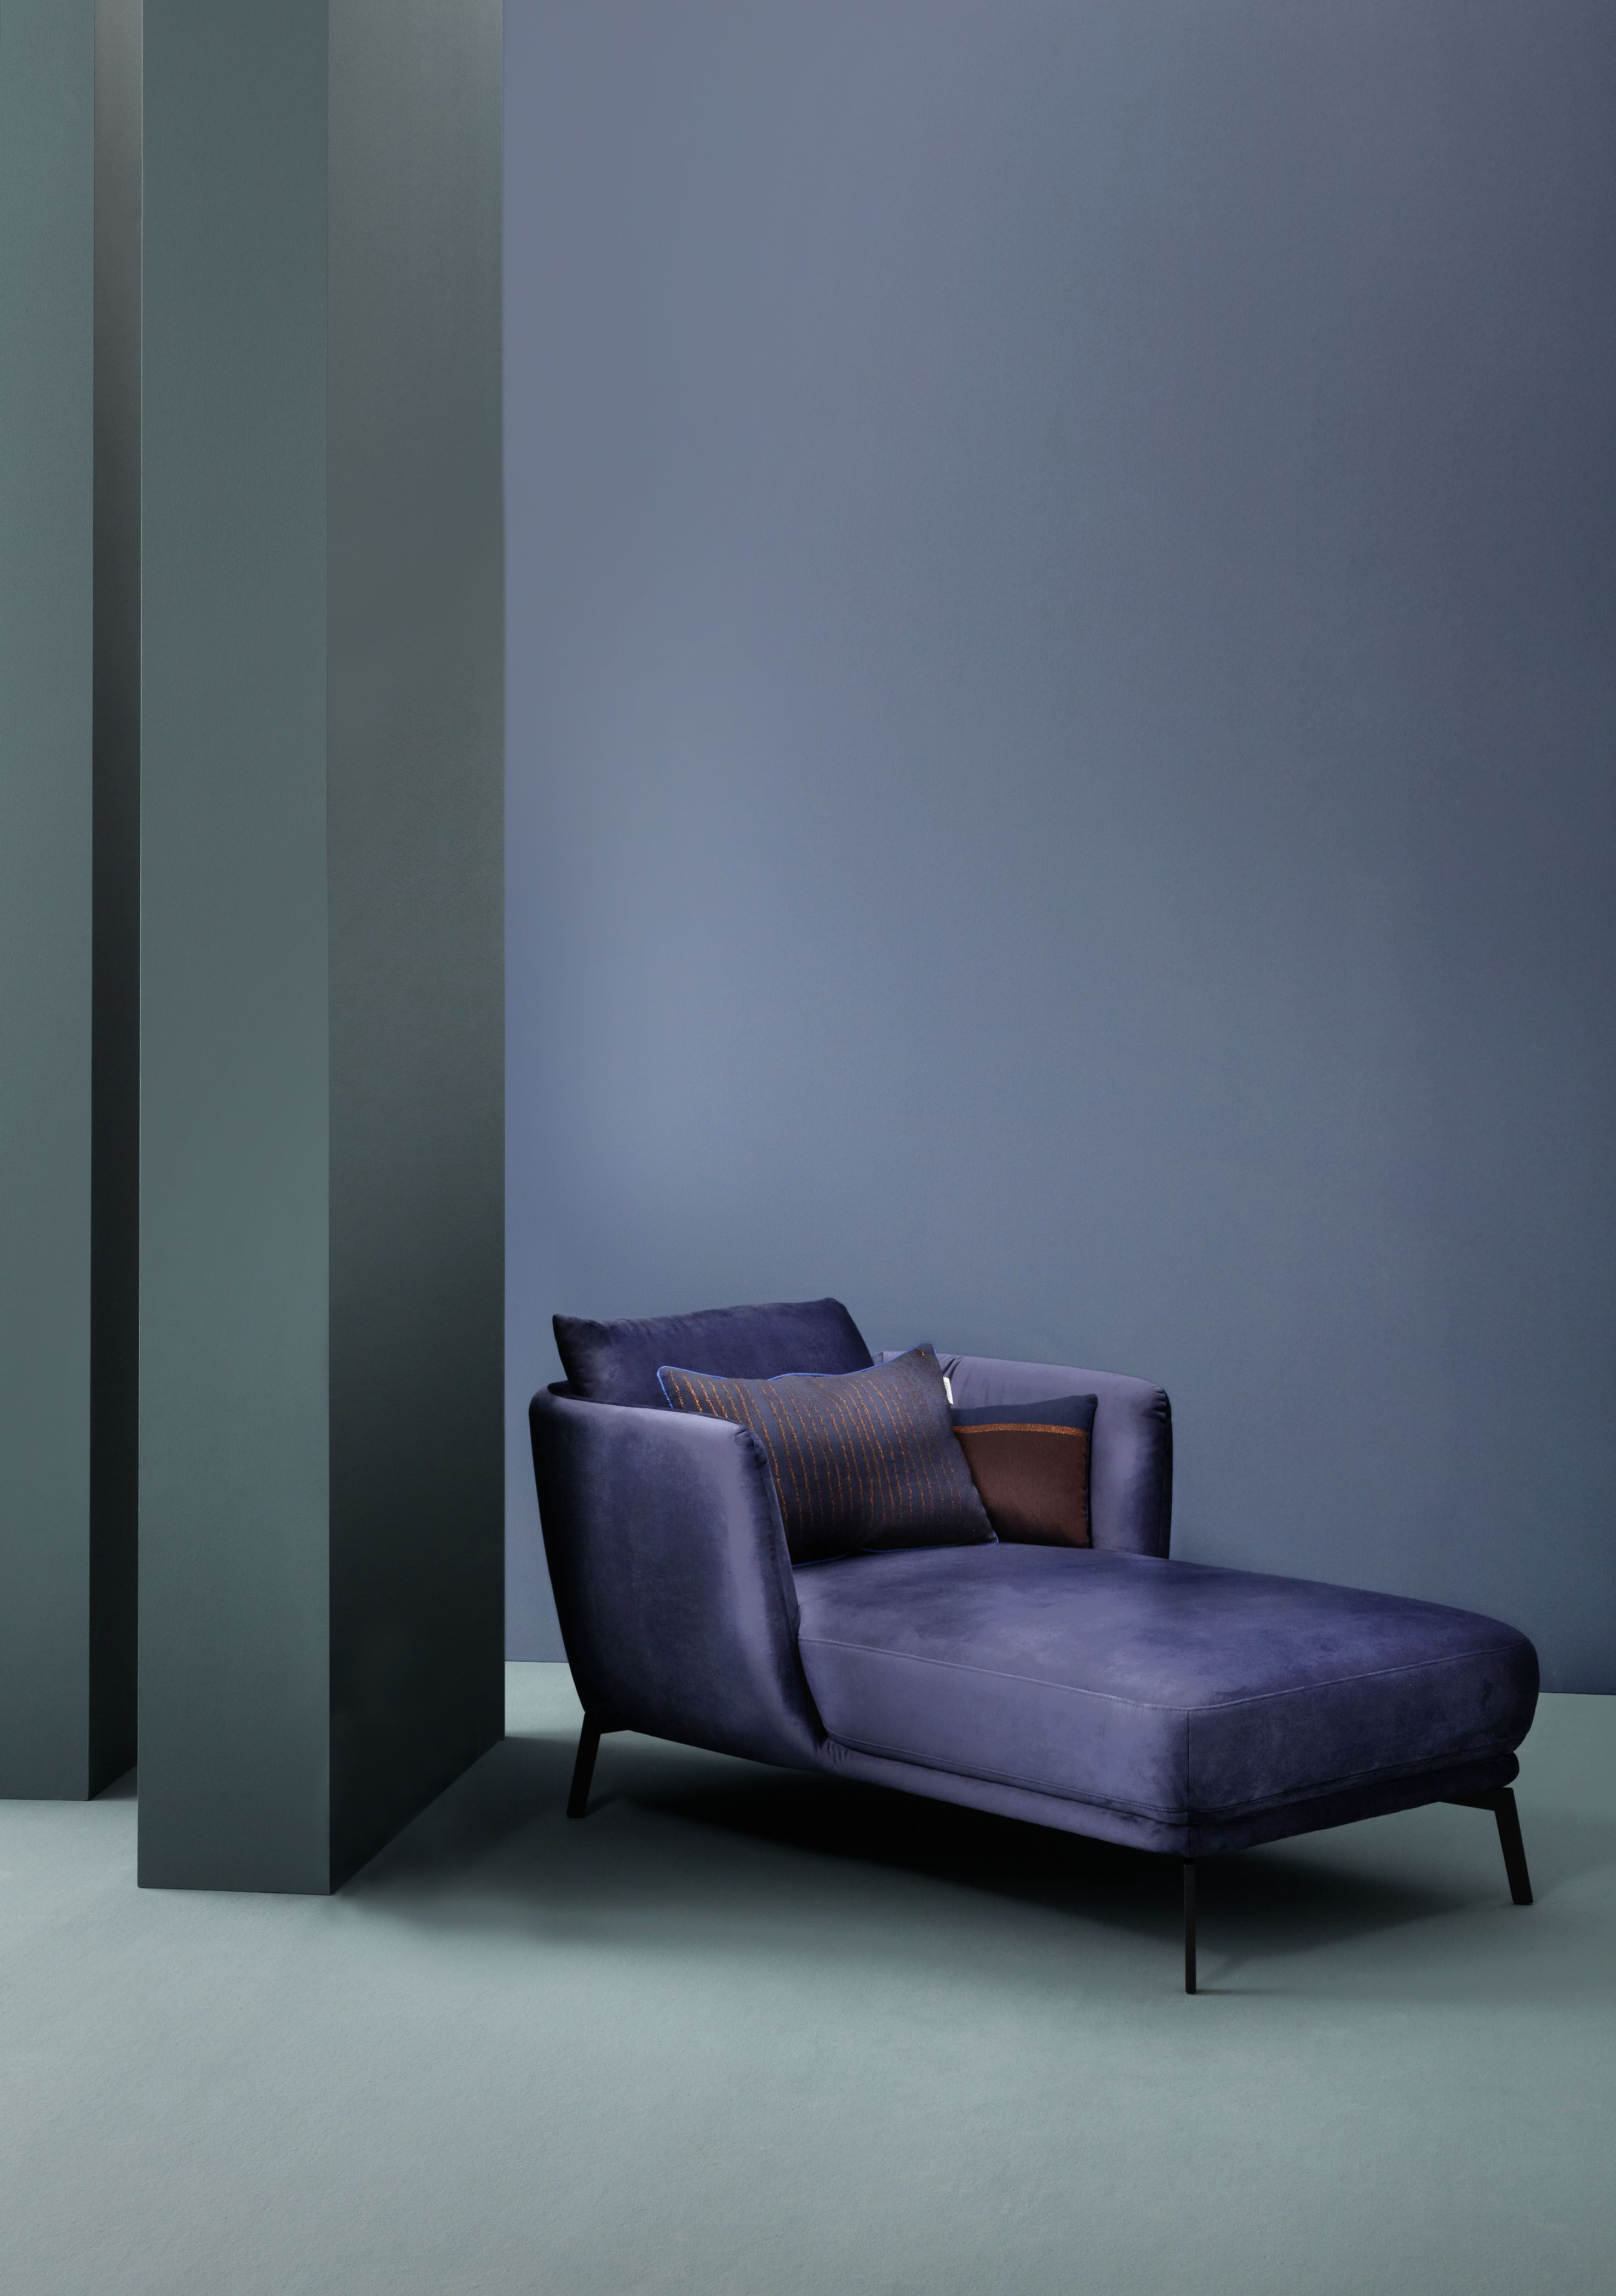 Longseat Pearl Mit Bildern Lounge Sessel Sessel Schoner Wohnen